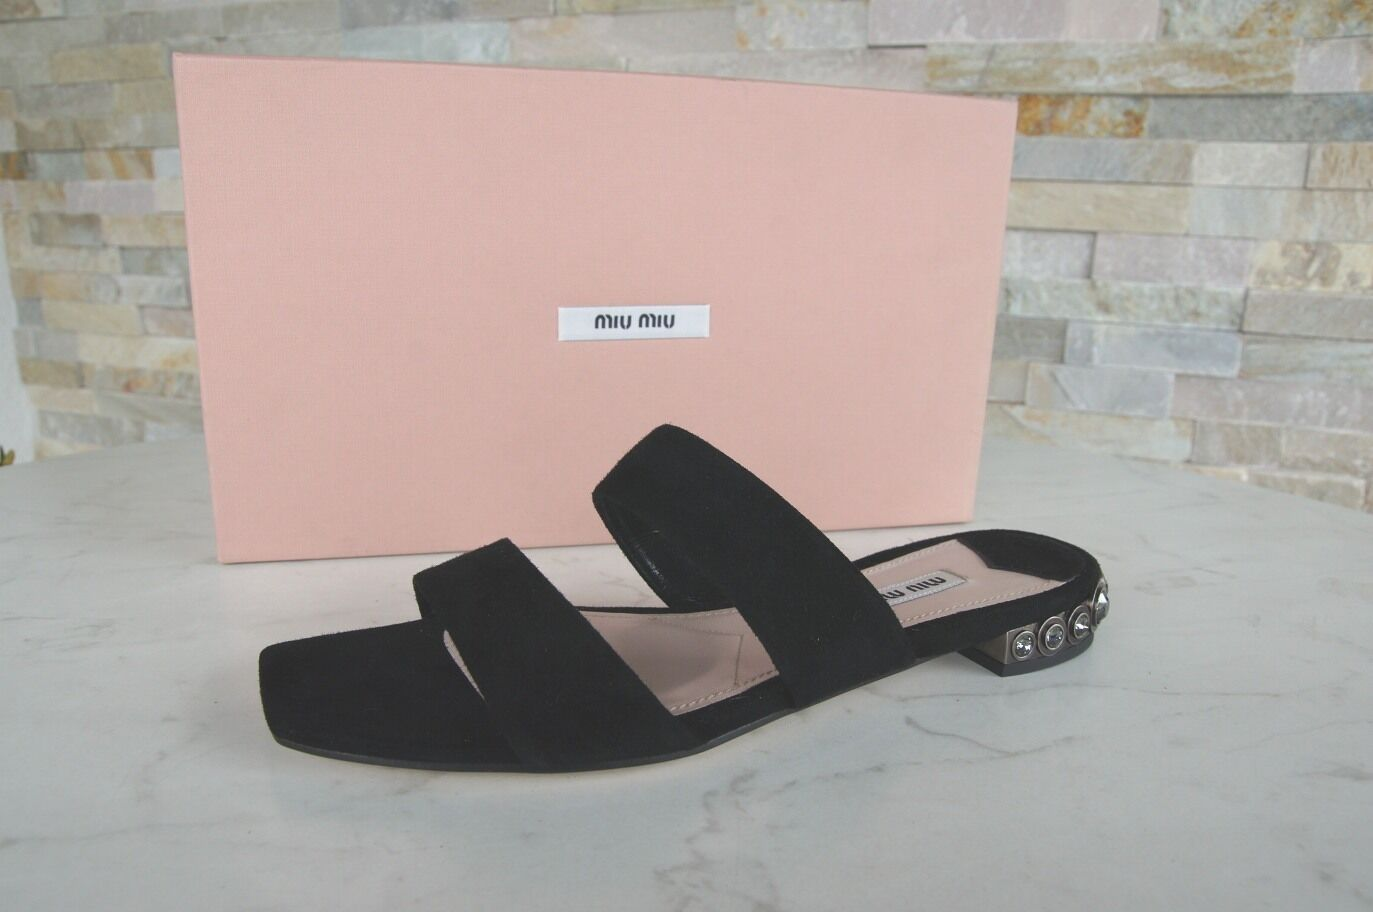 Miu Miu sandalias sandalias zapatos sandalias negro nuevo PVP